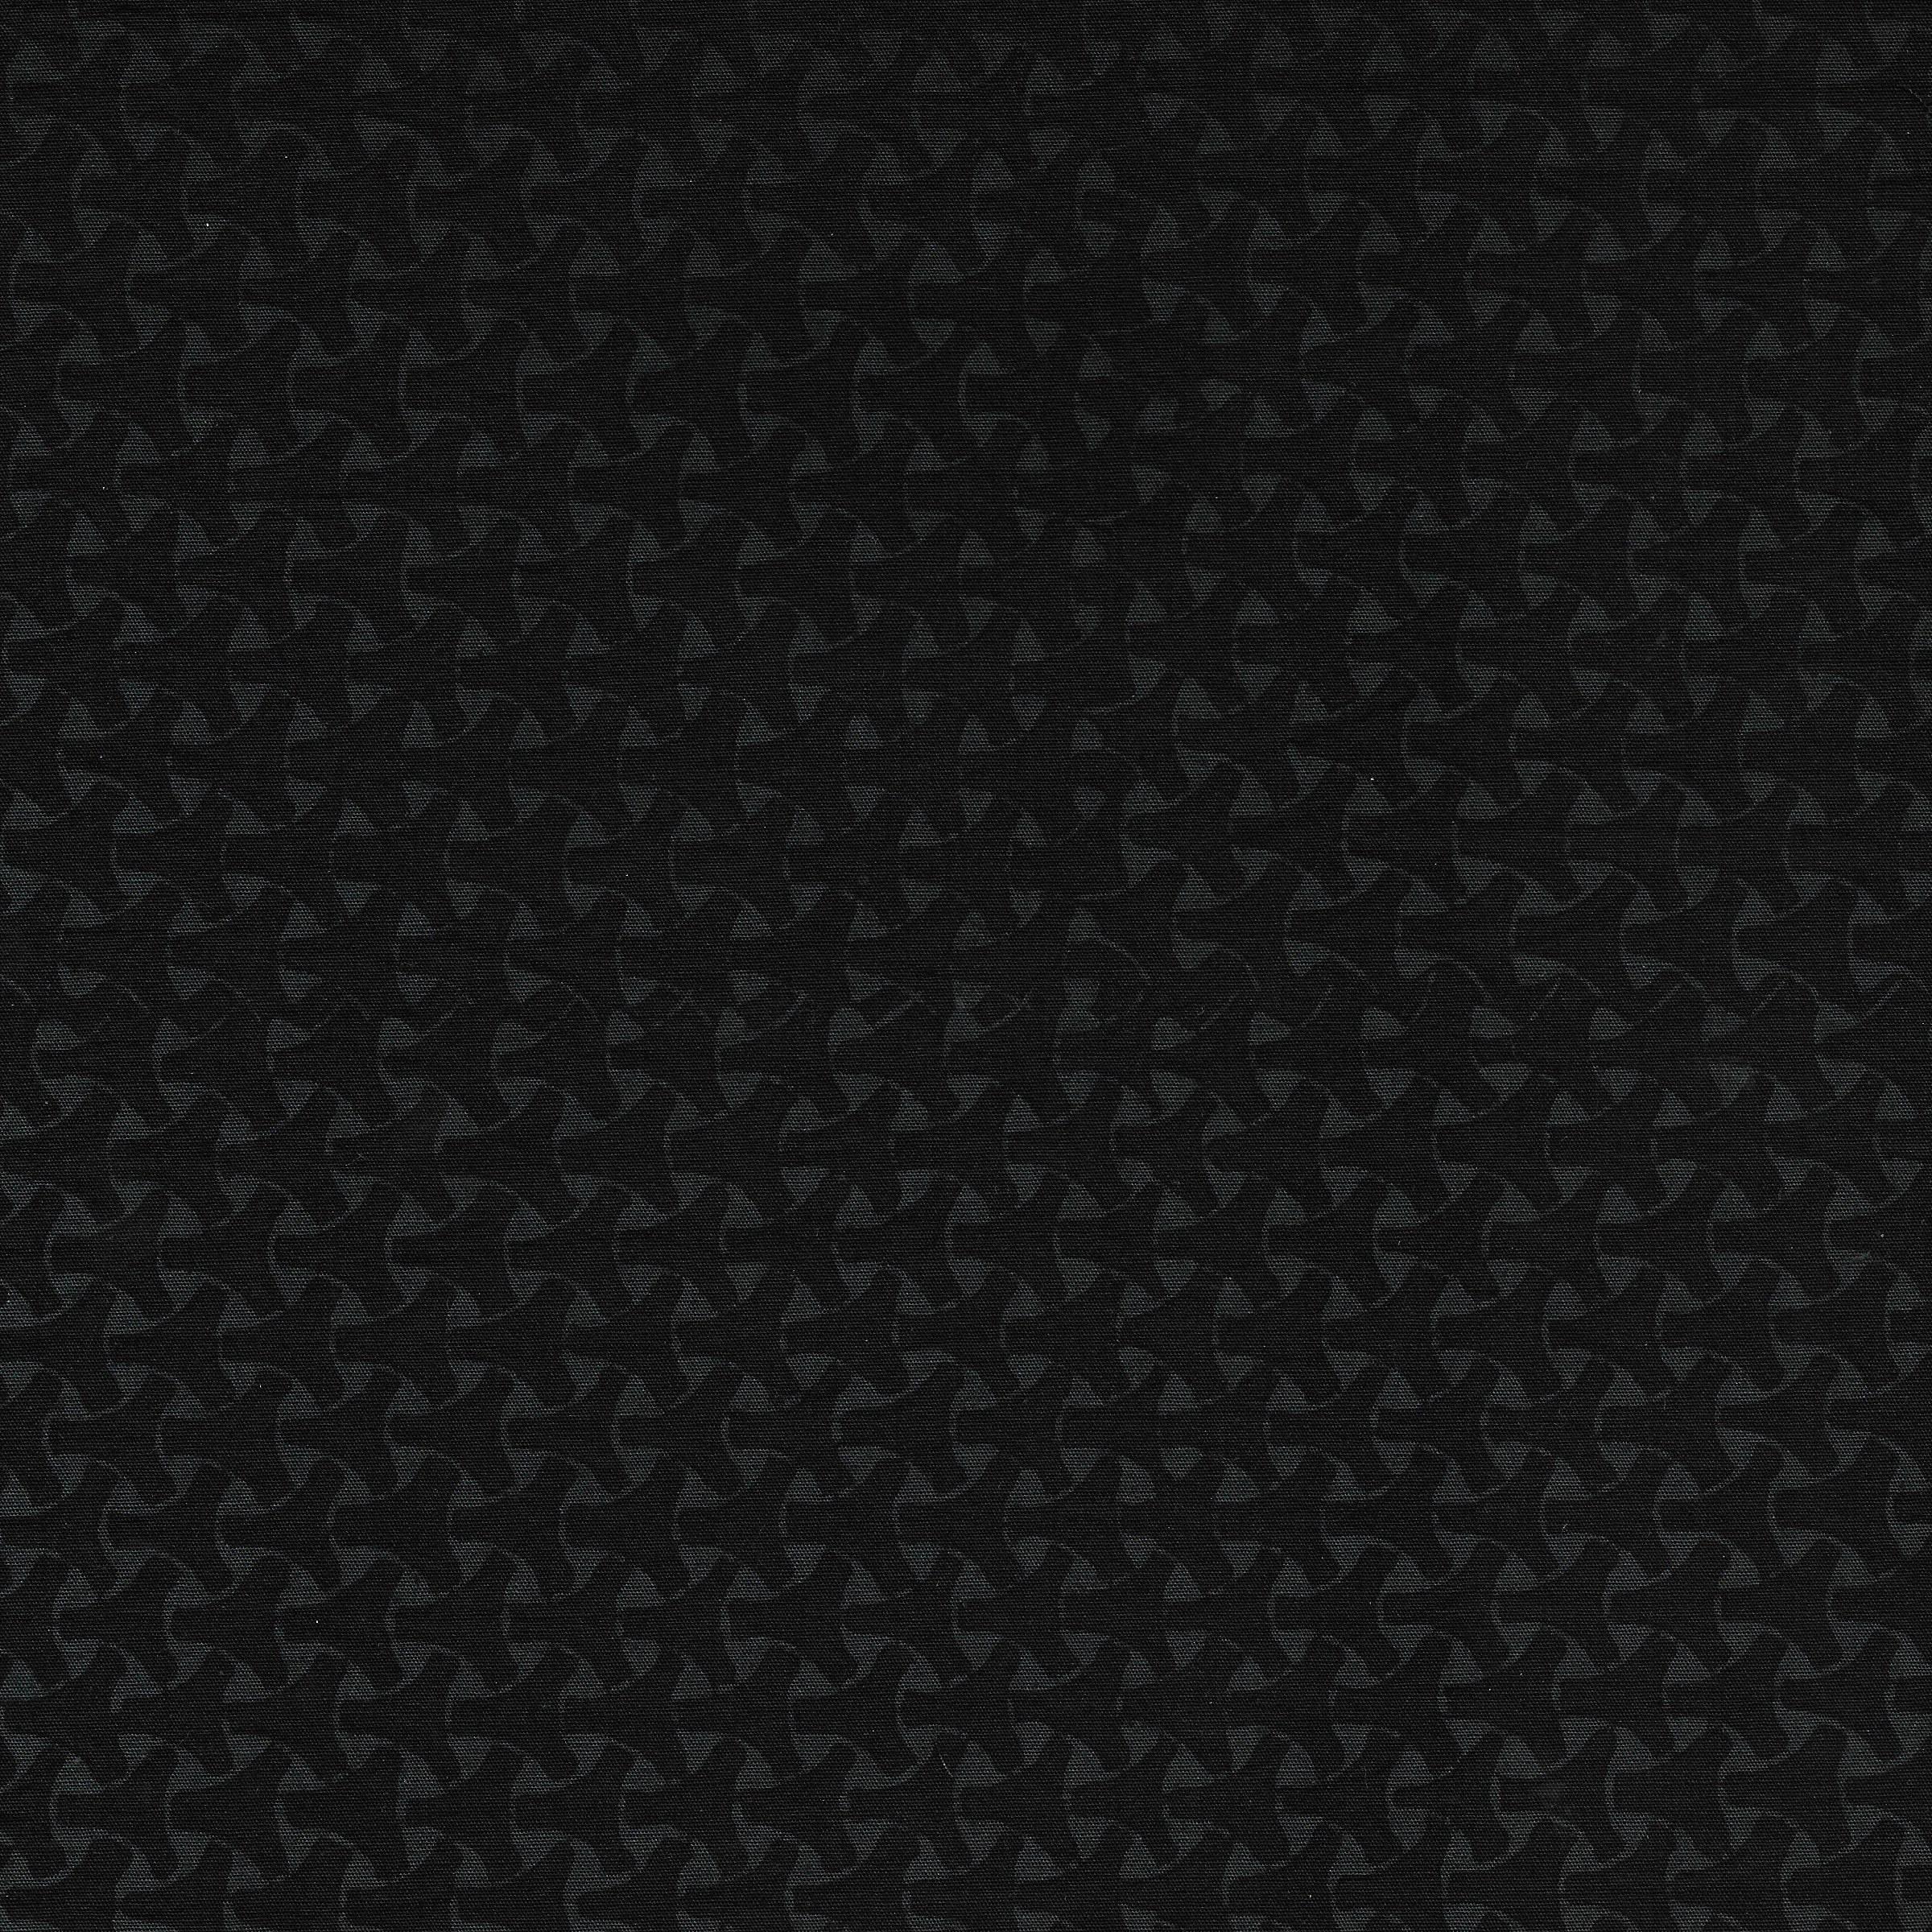 111922796 / Knob-Black